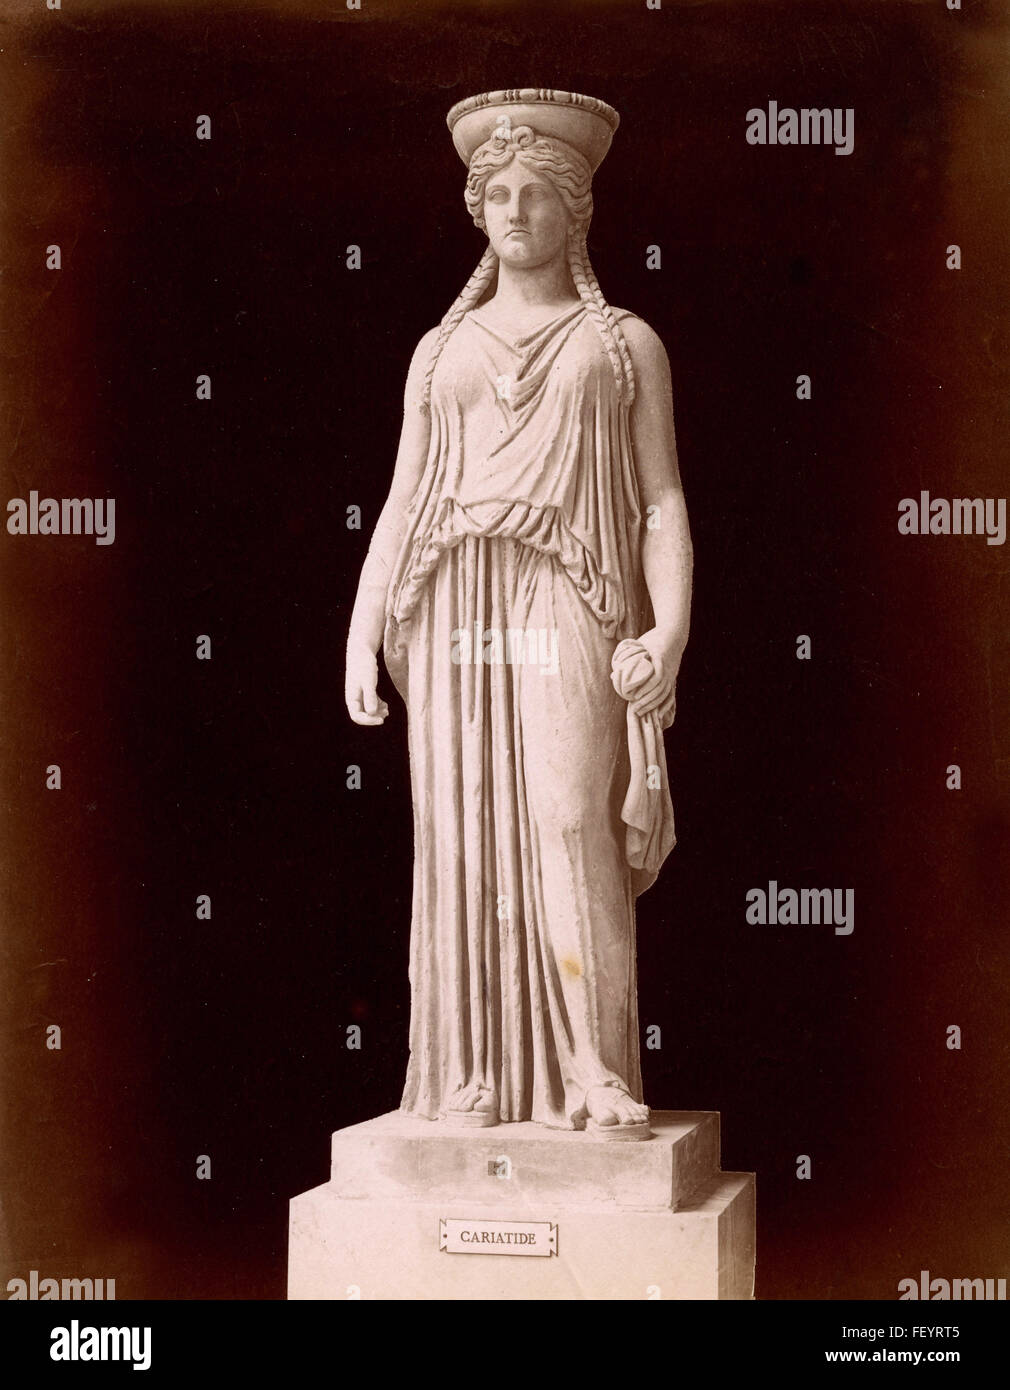 Caryatid of Pandrosium, Greek statue - Stock Image